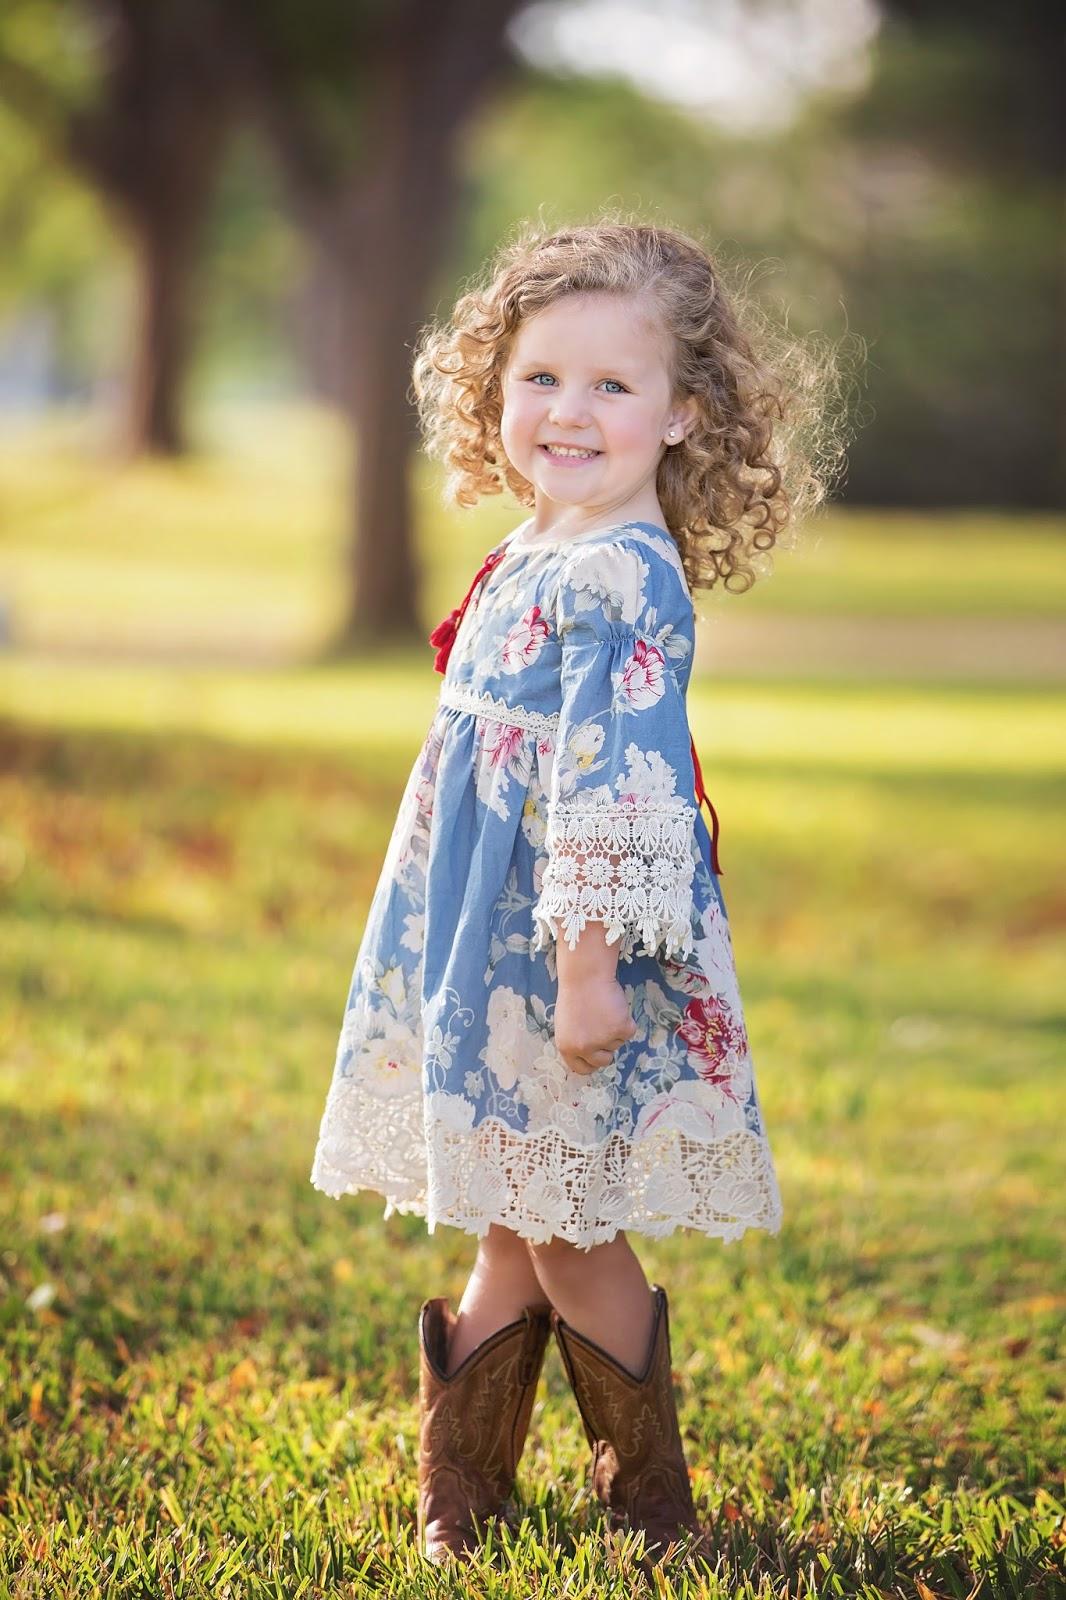 Haute Baby: A RECIPE FOR A PERFECT FAMILY PORTRAIT